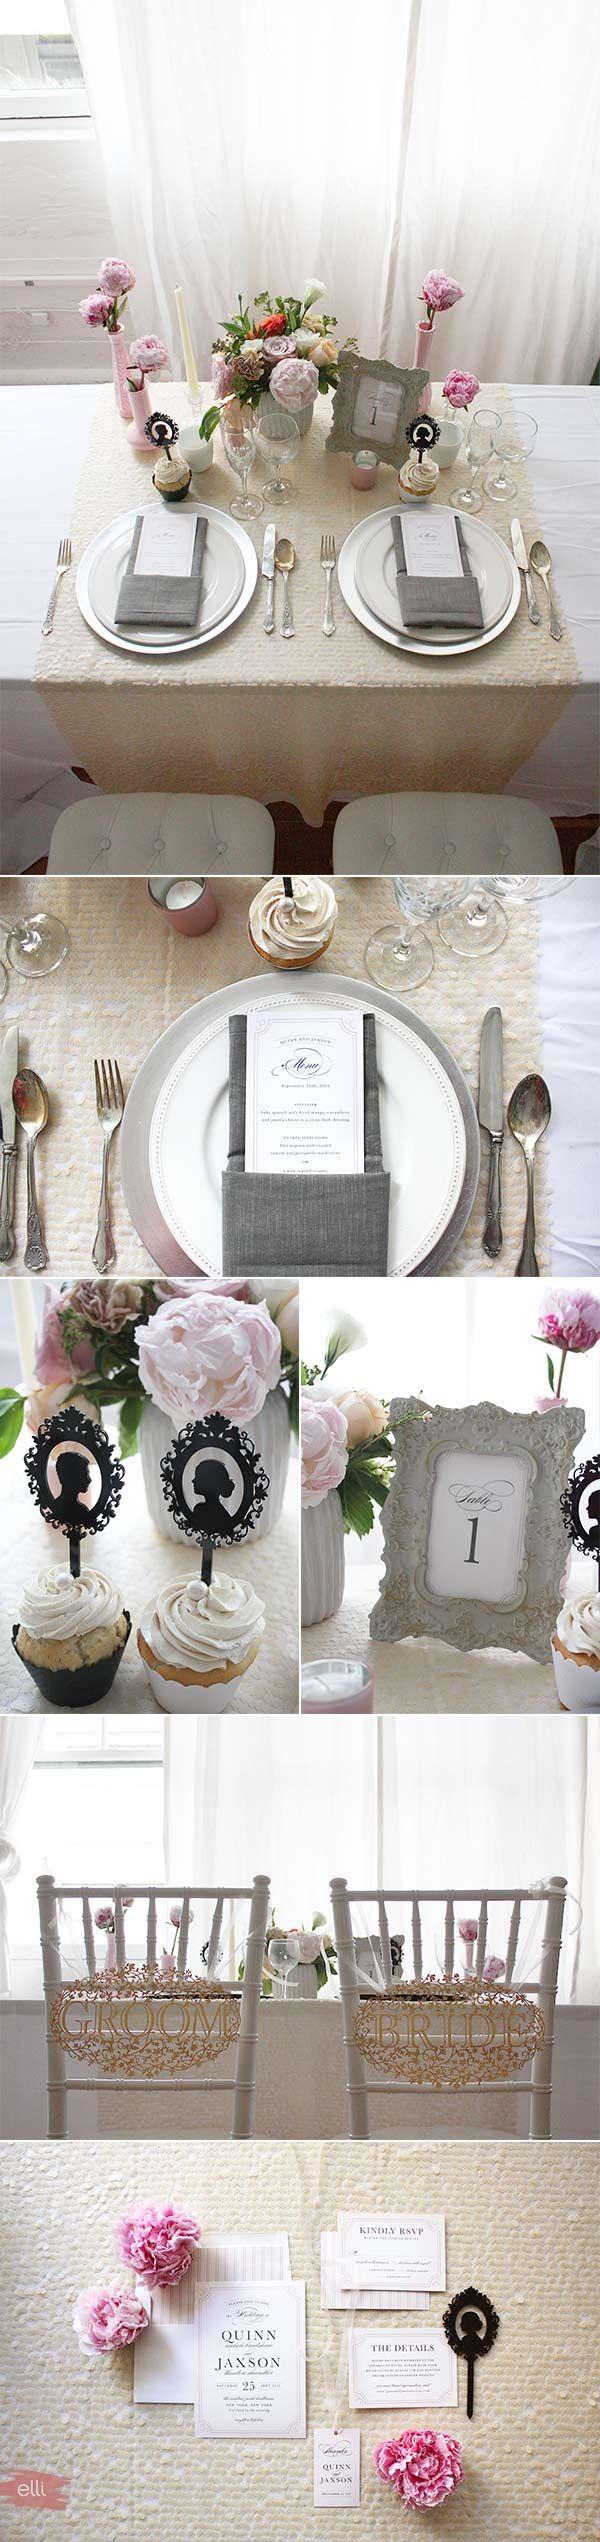 103 best Blush Pink Wedding images on Pinterest | Wedding decor ...